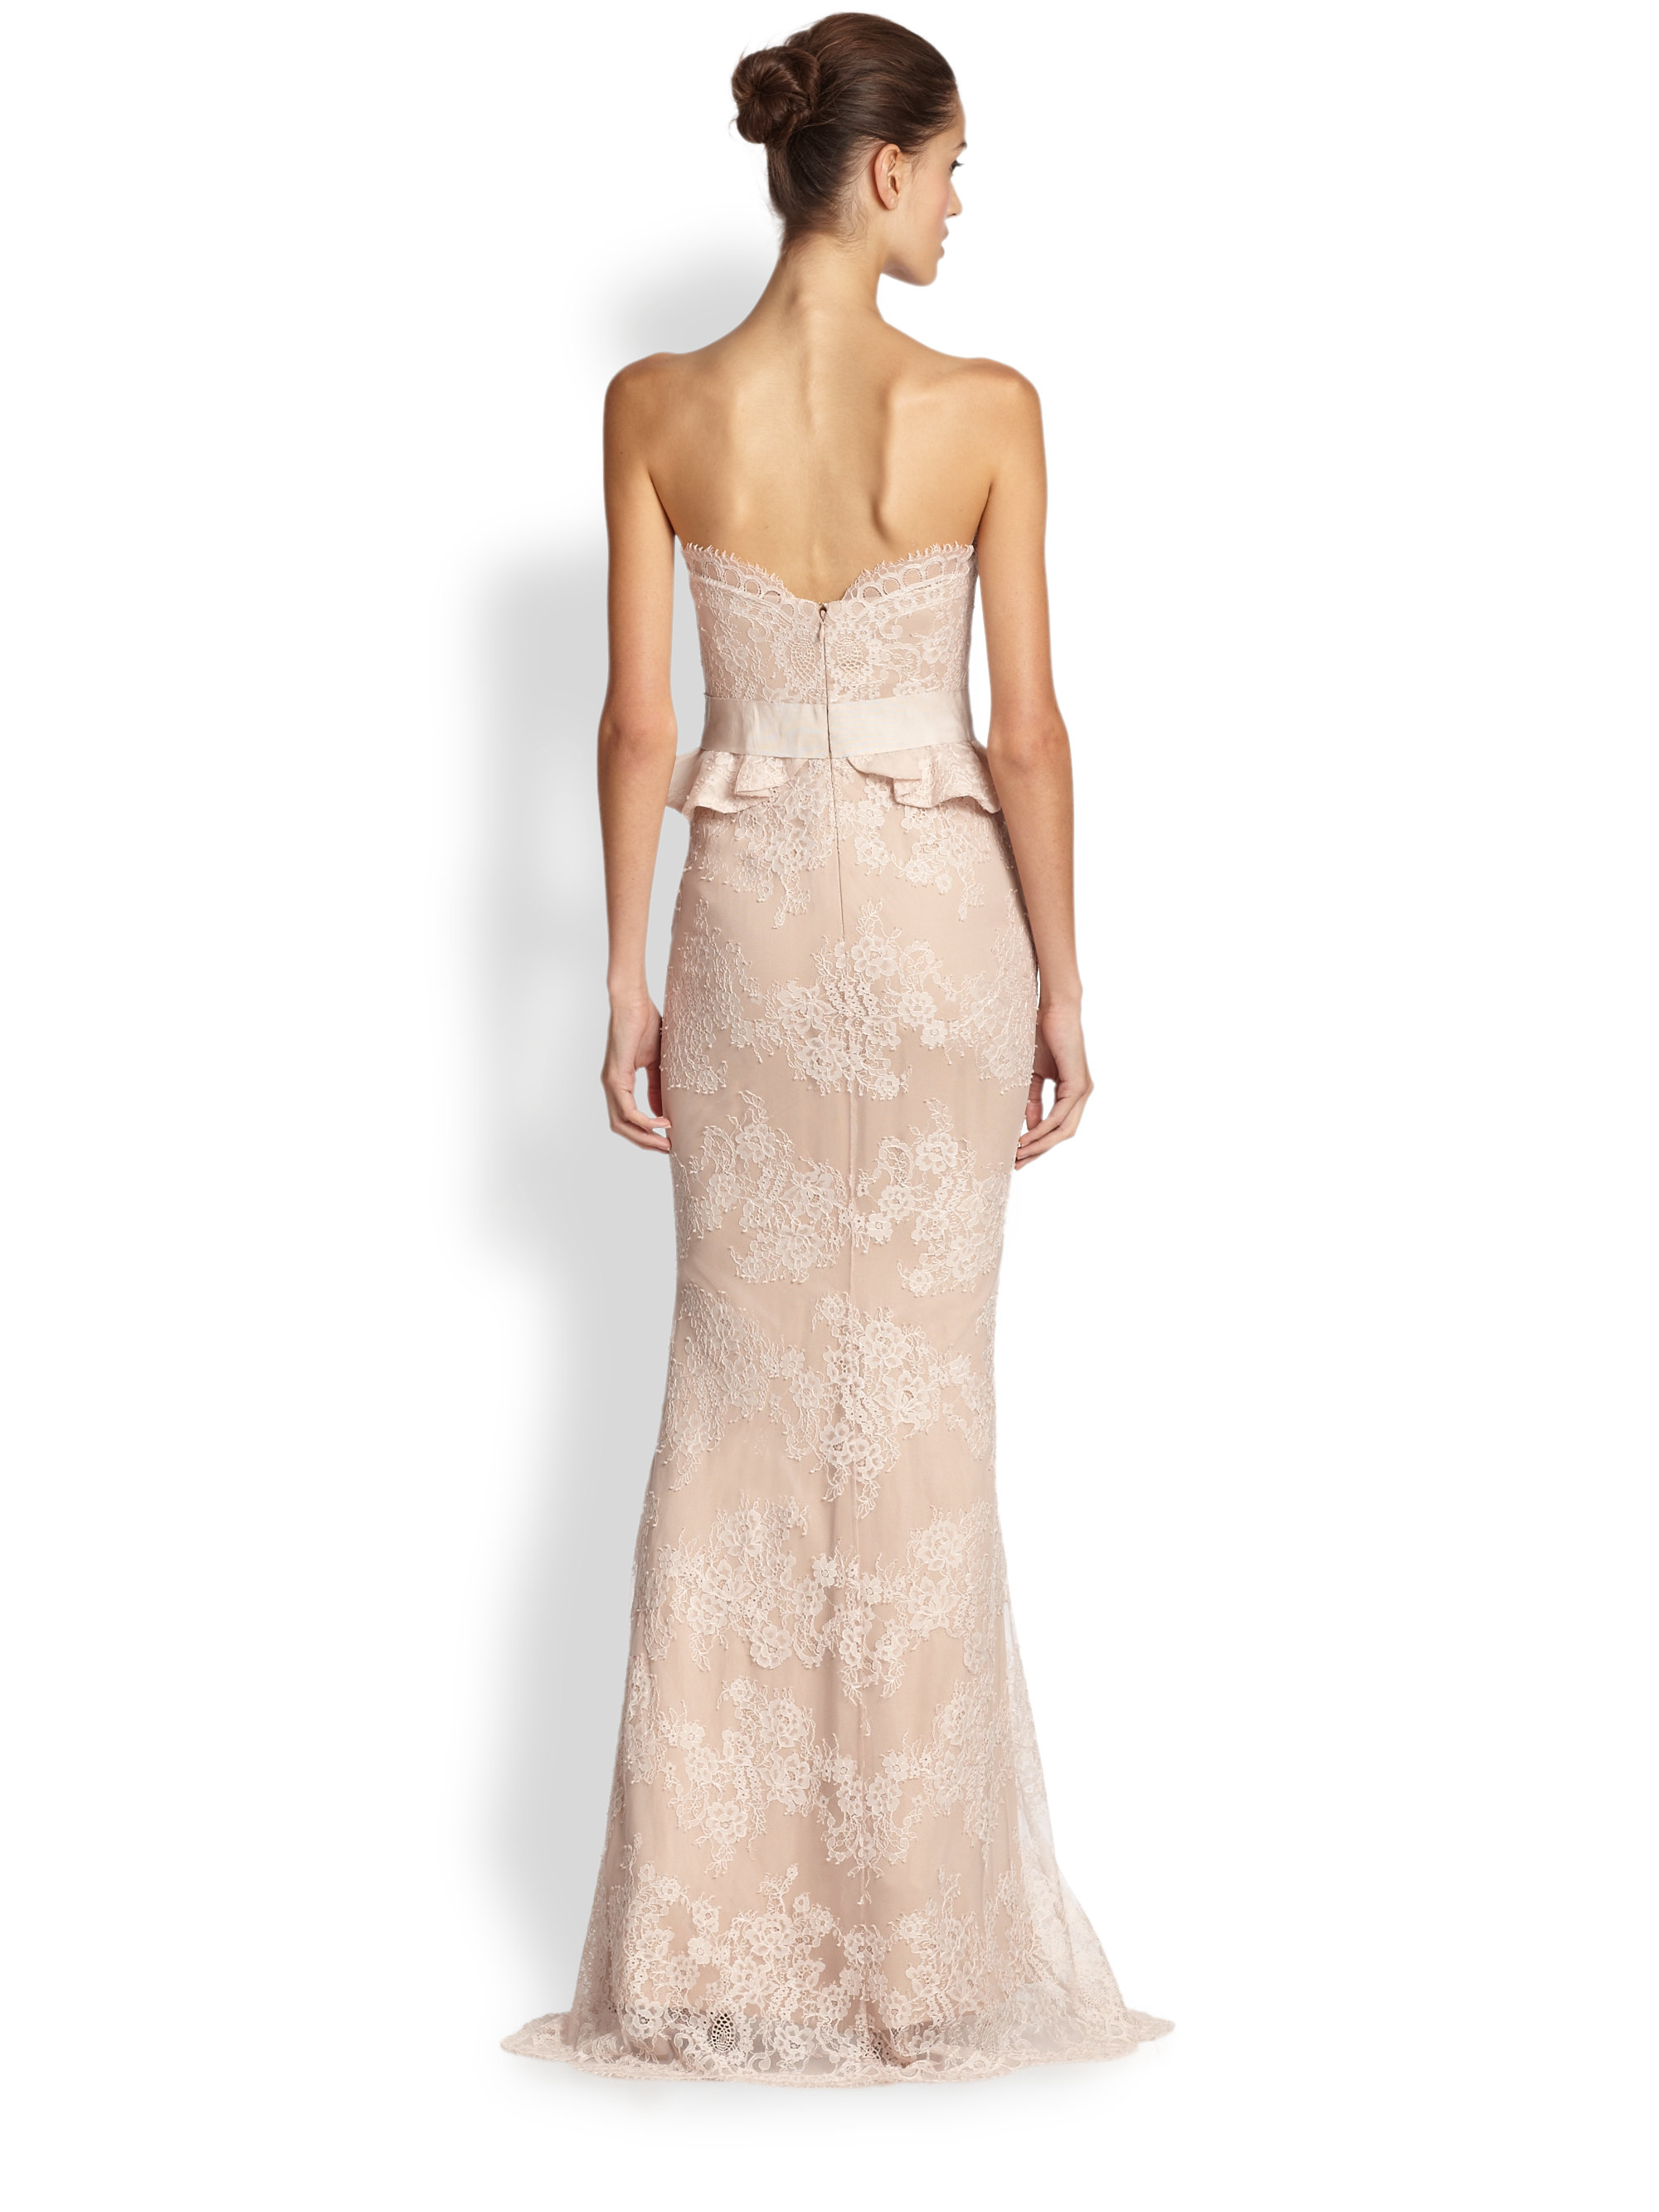 0d9fcbea Marchesa notte Silk Strapless Lace Peplum Gown in Pink - Lyst